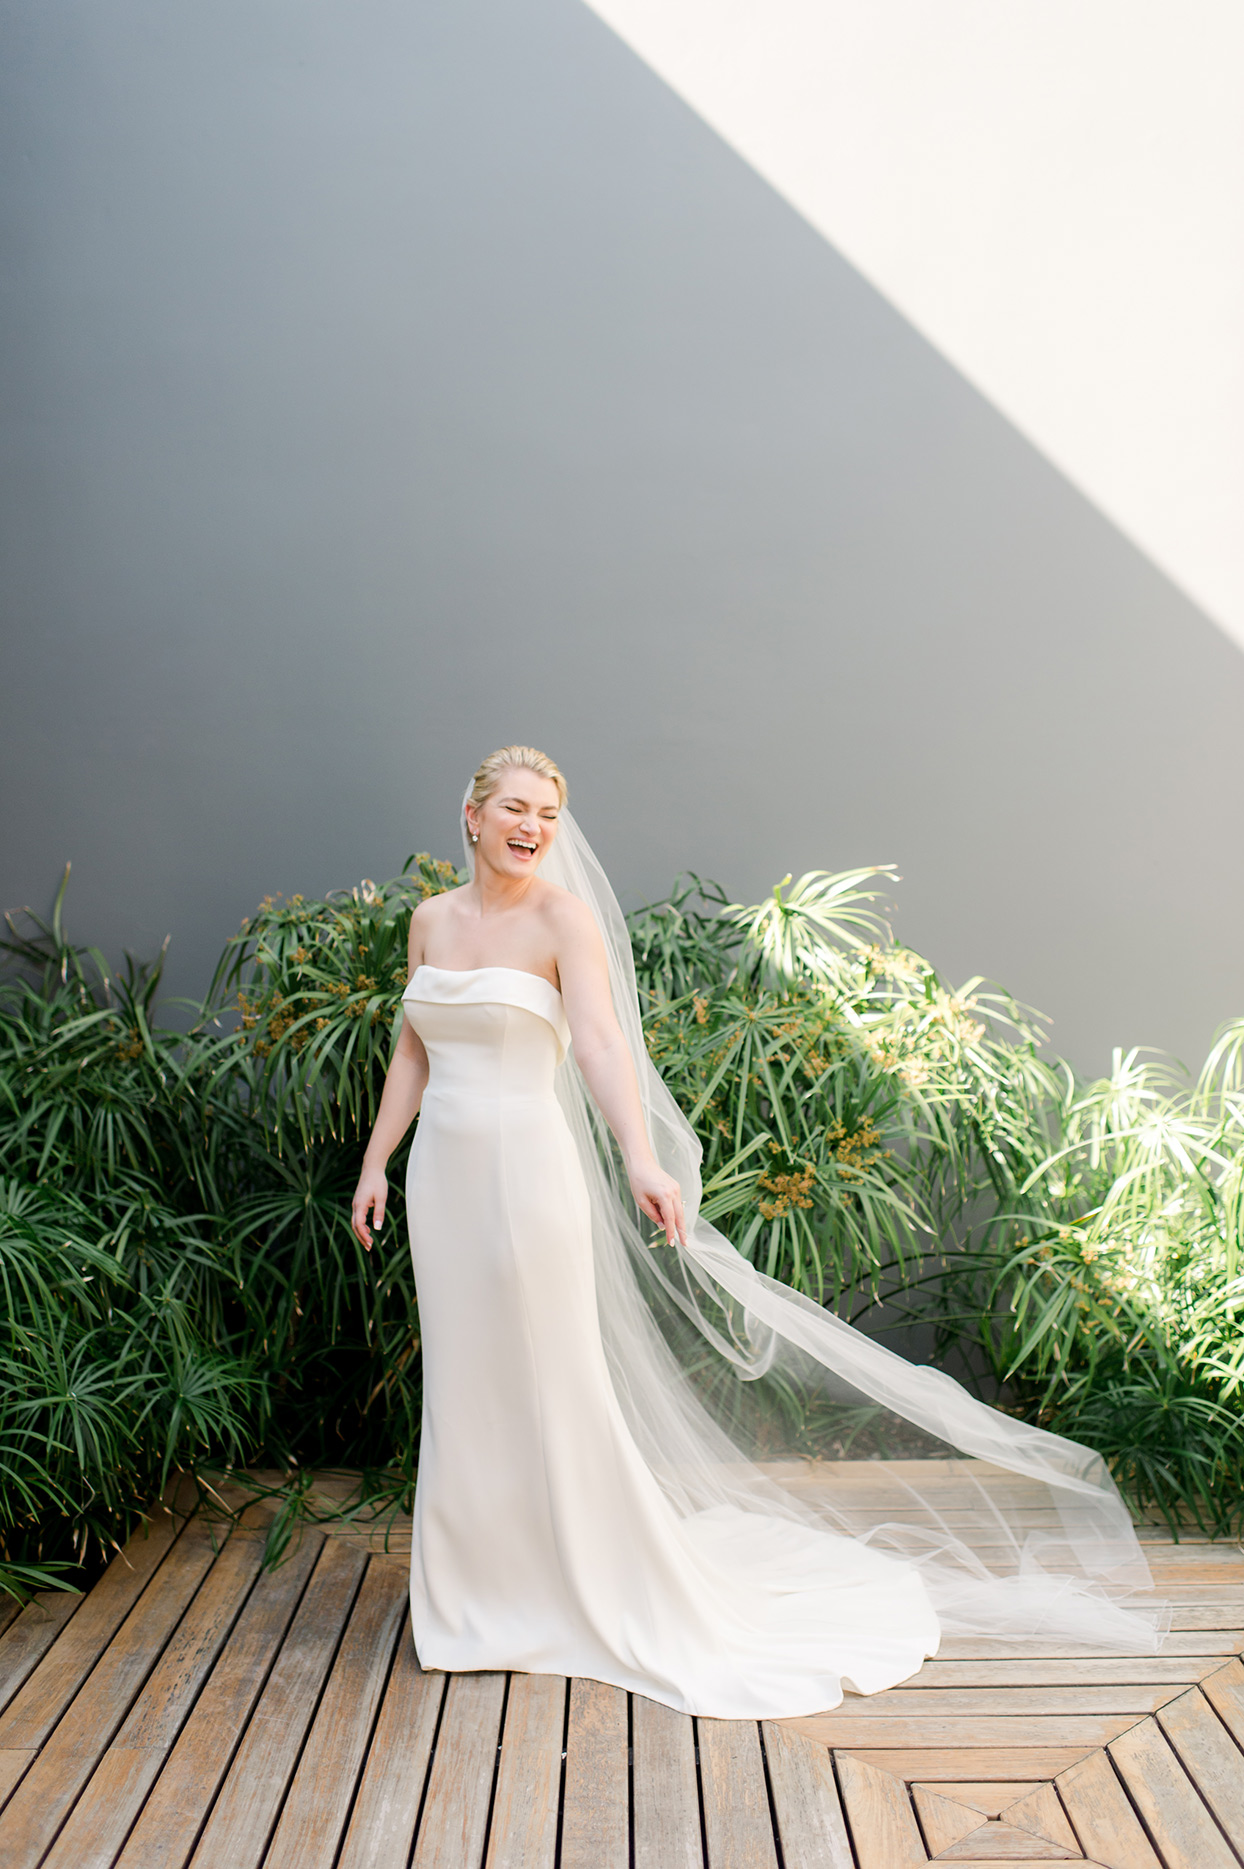 katie nick wedding bride laughing